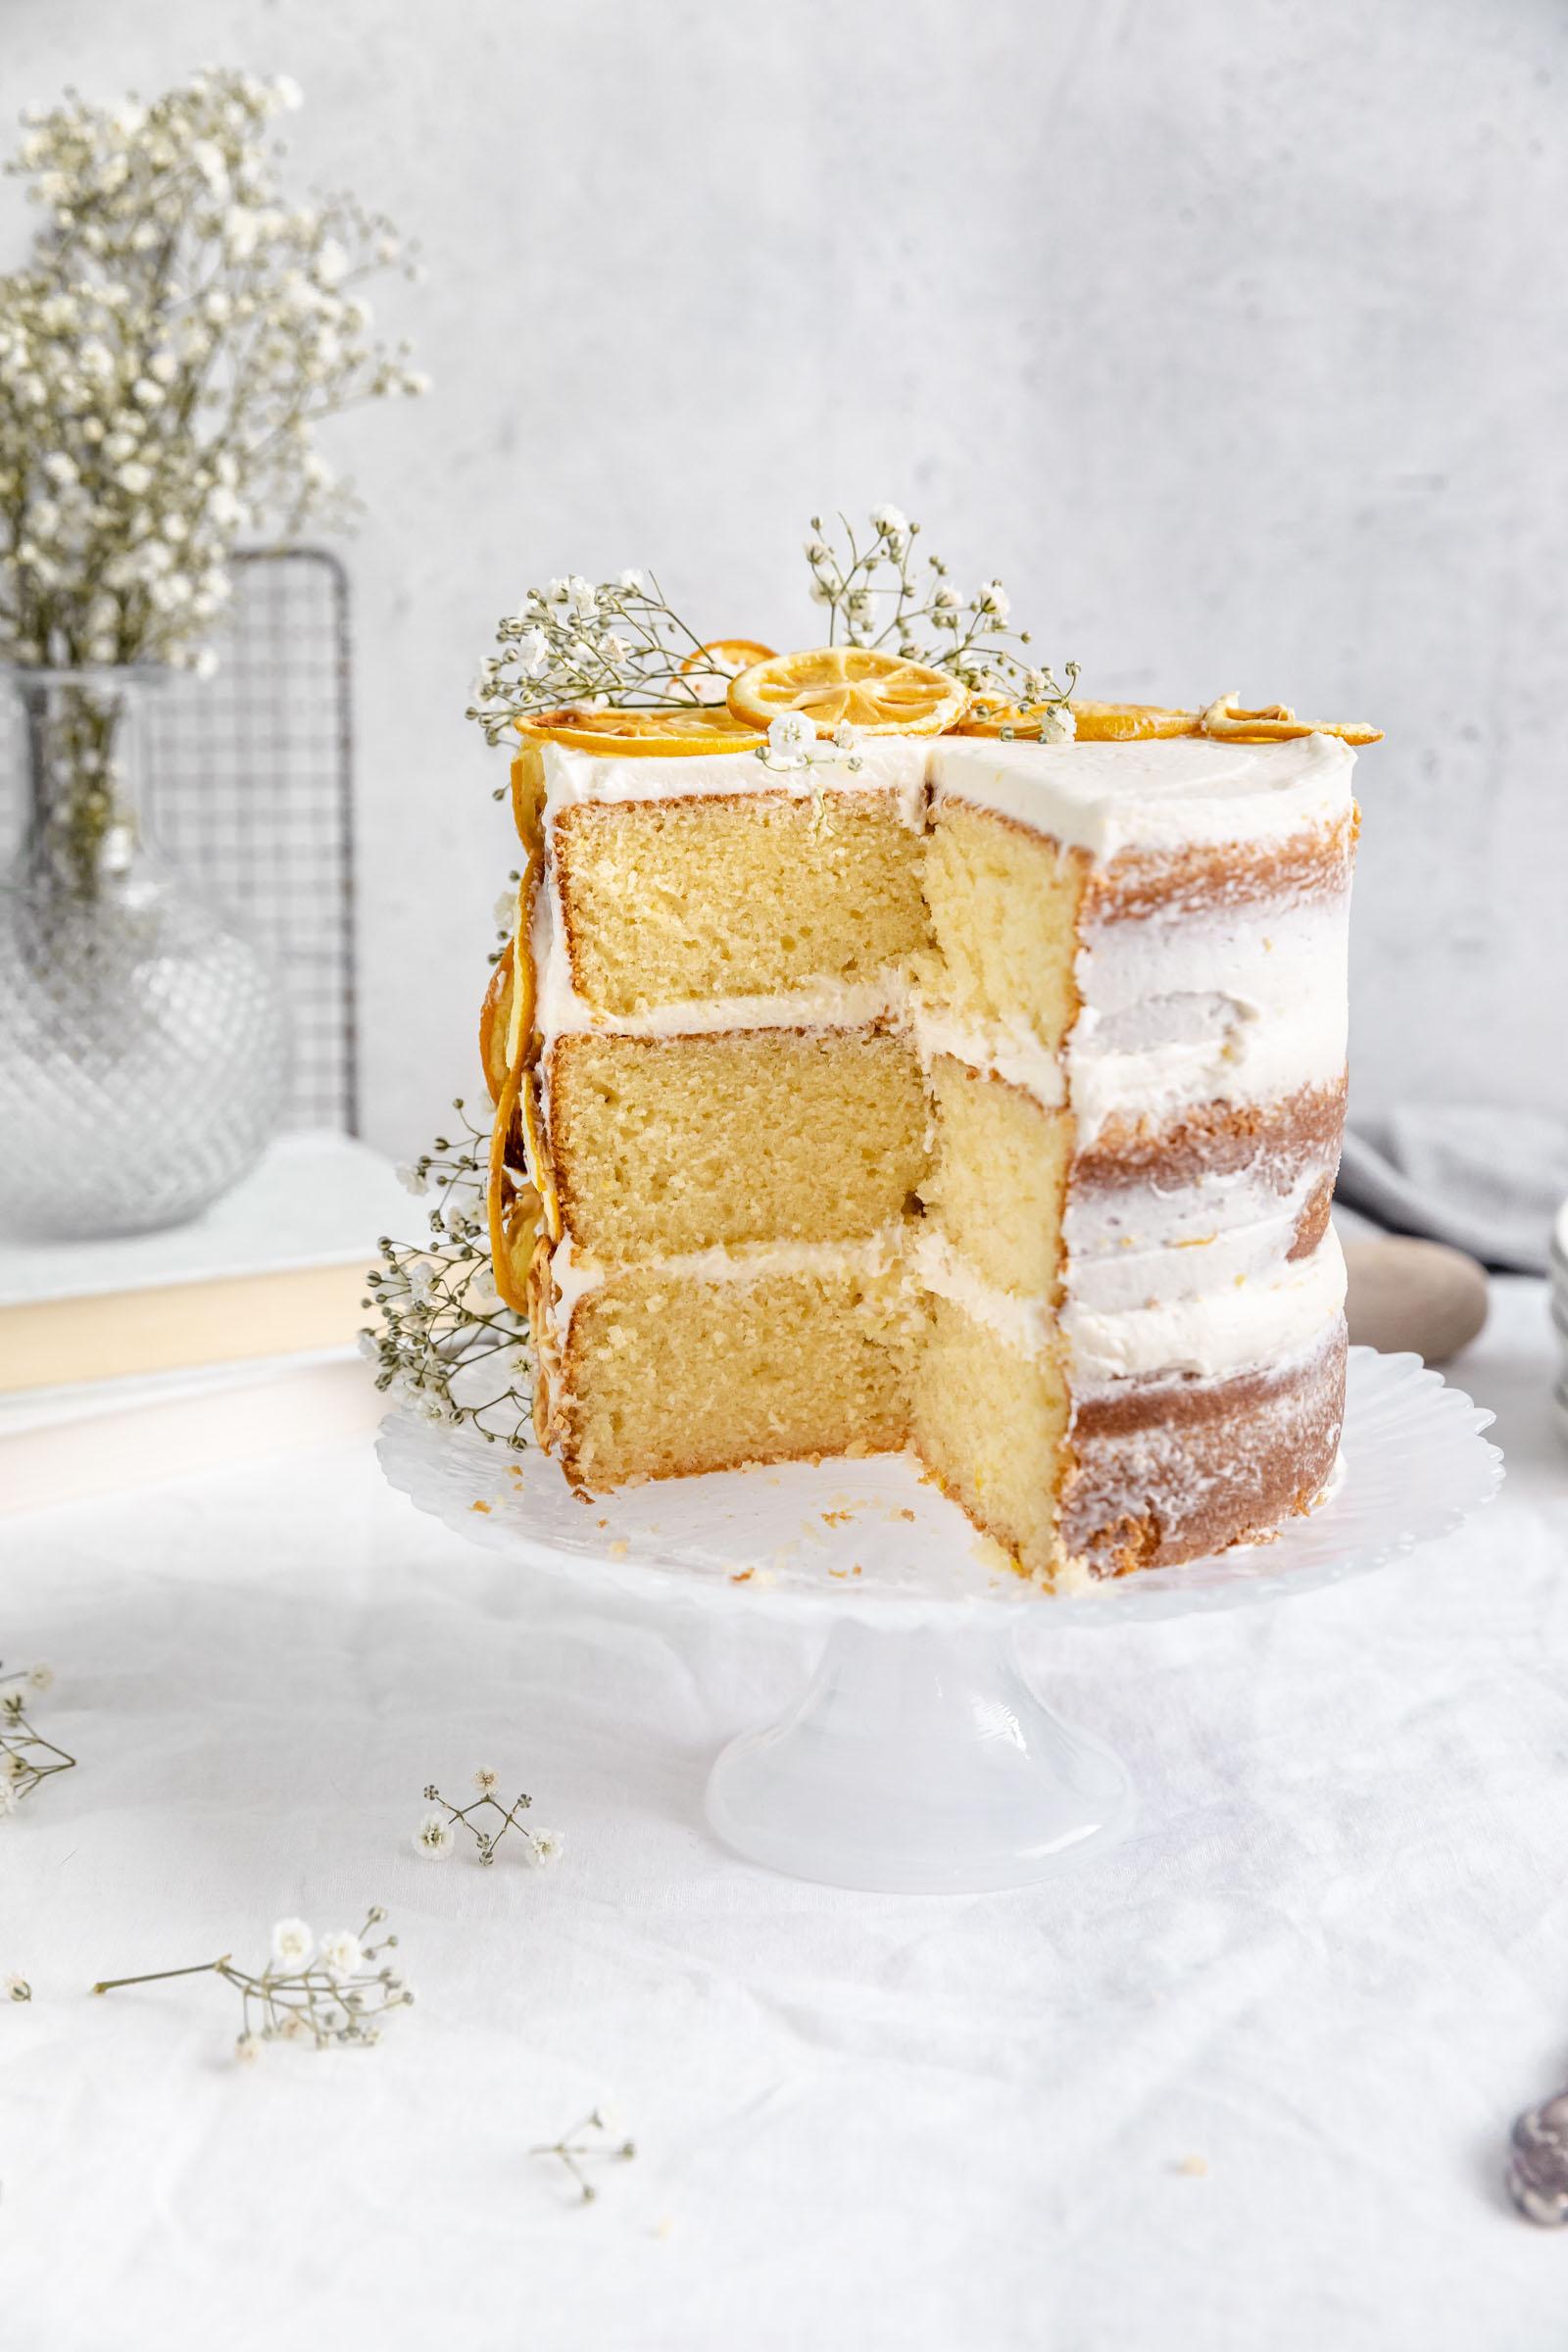 lemon layer cake cut into